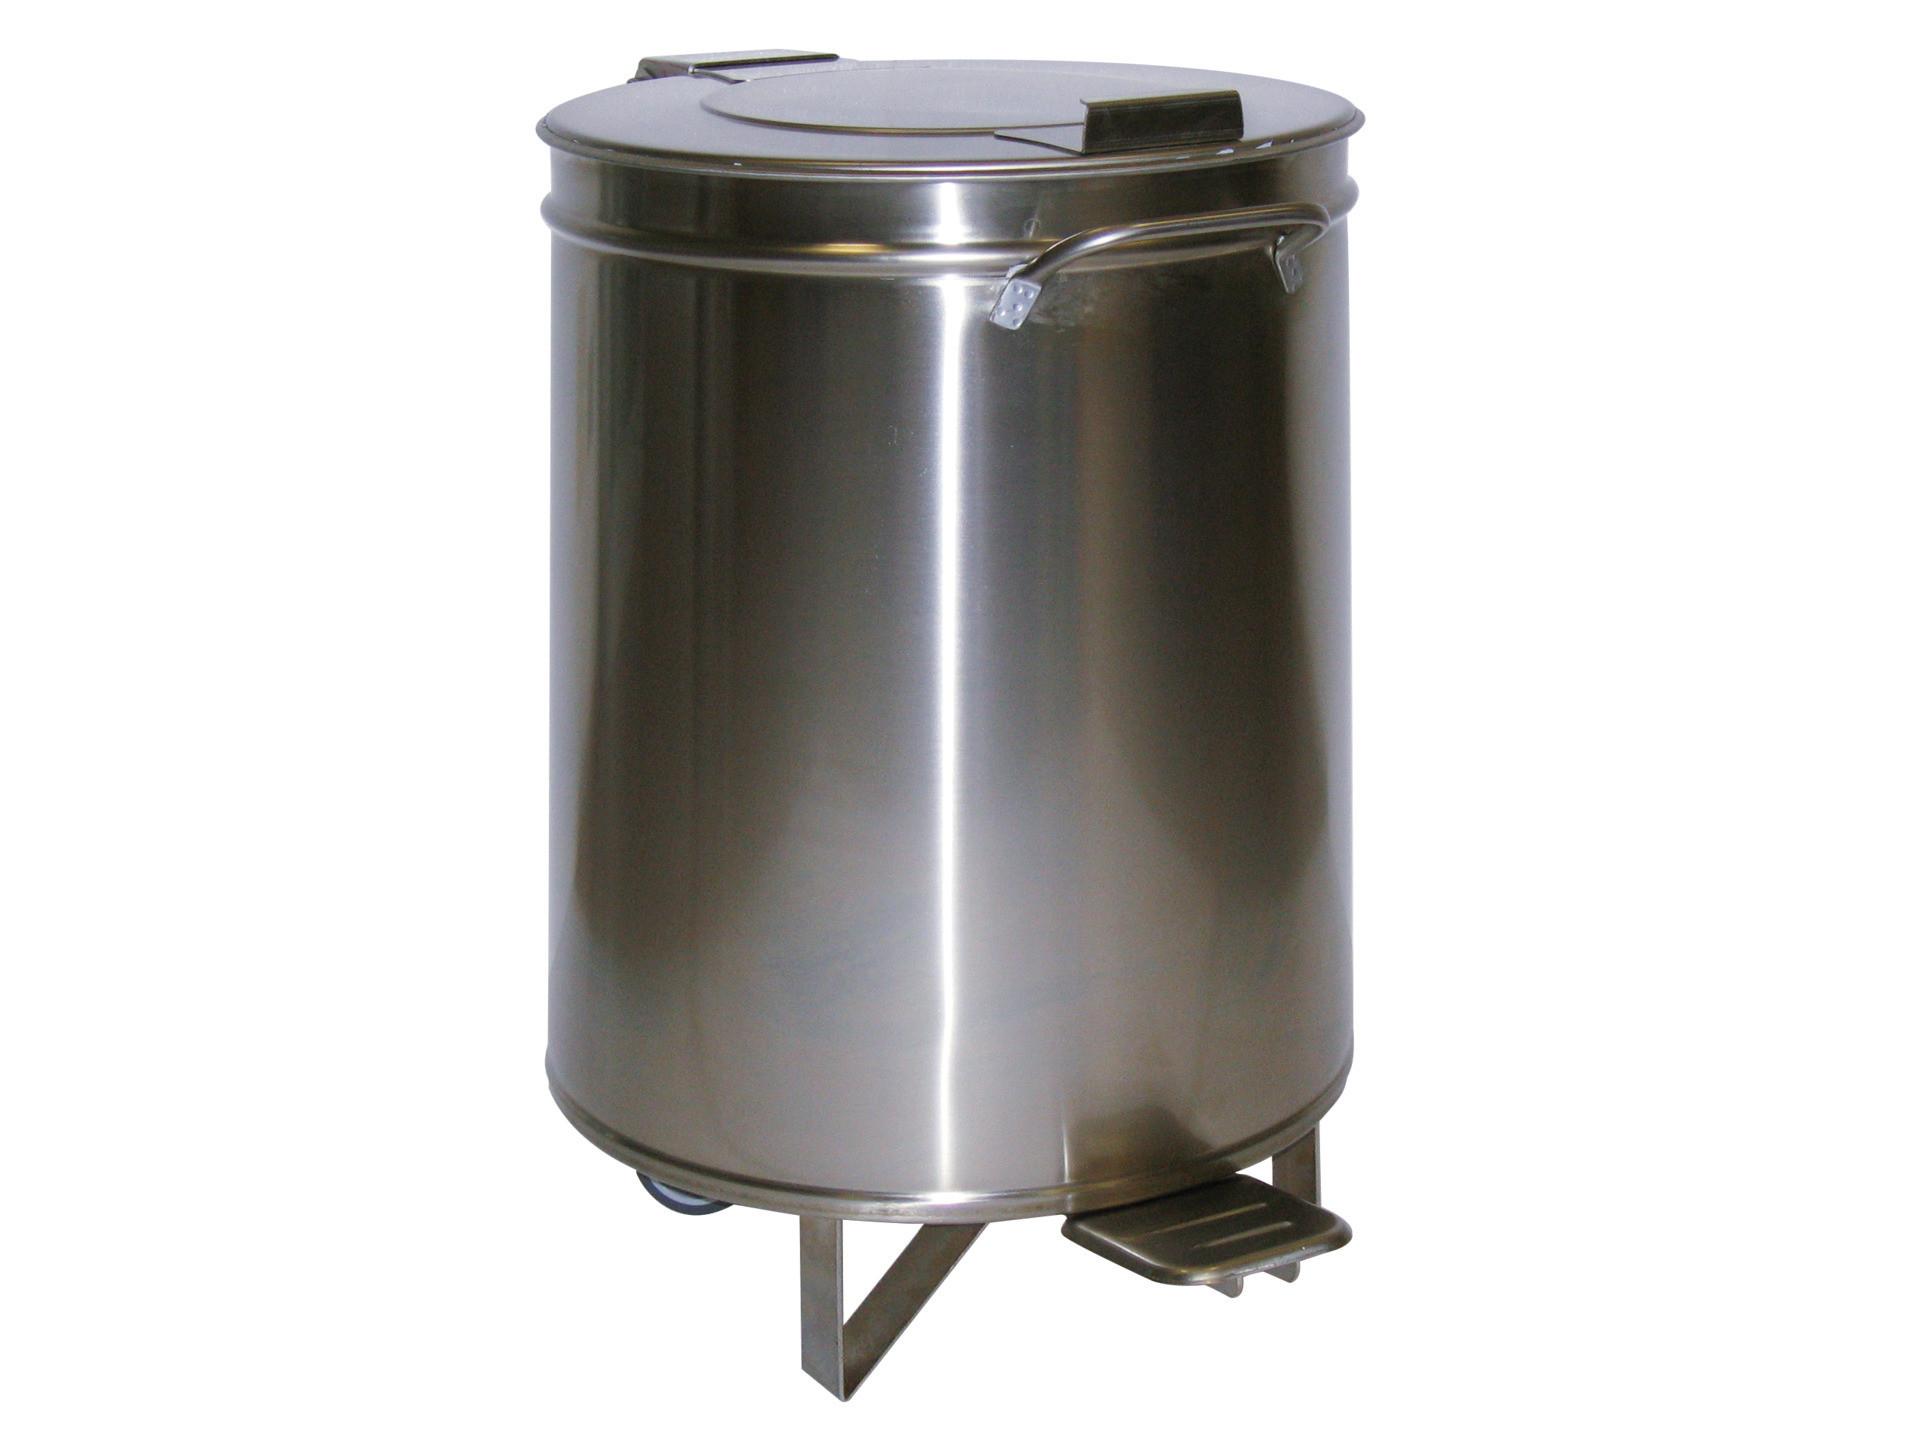 Abfalleimer 95 l ø 450 mm mit Fußpedal und Hub-Deckel 450 x 450 x 685 mm